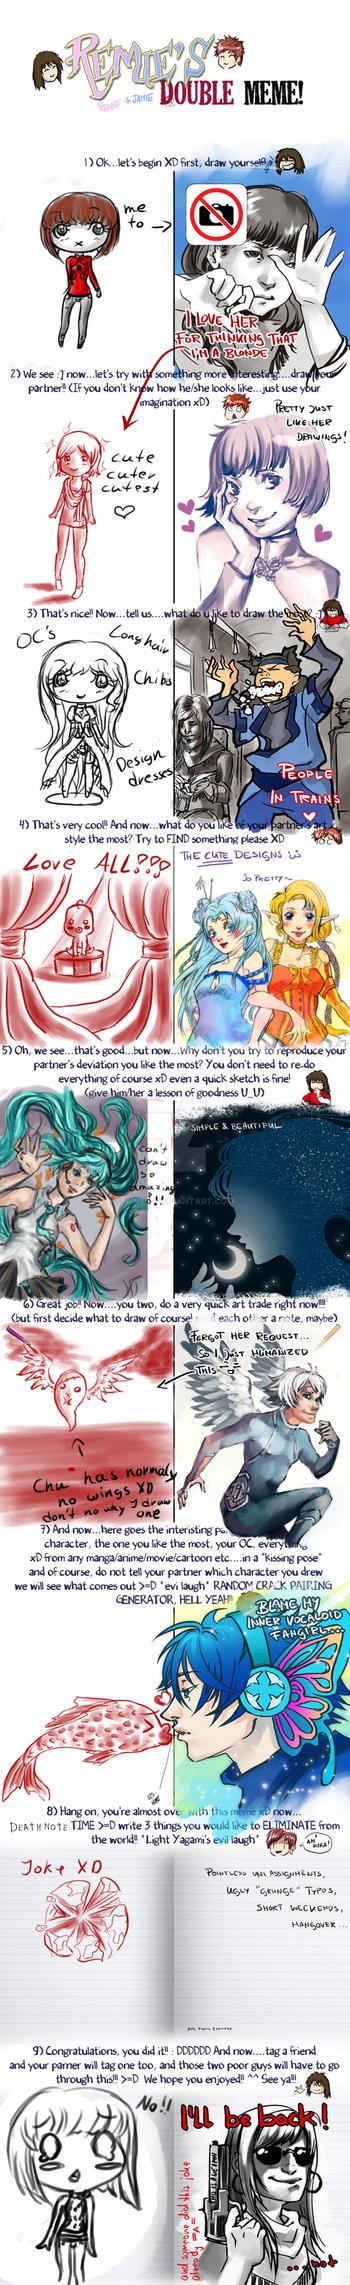 Double Meme Ashai-C by Aine55